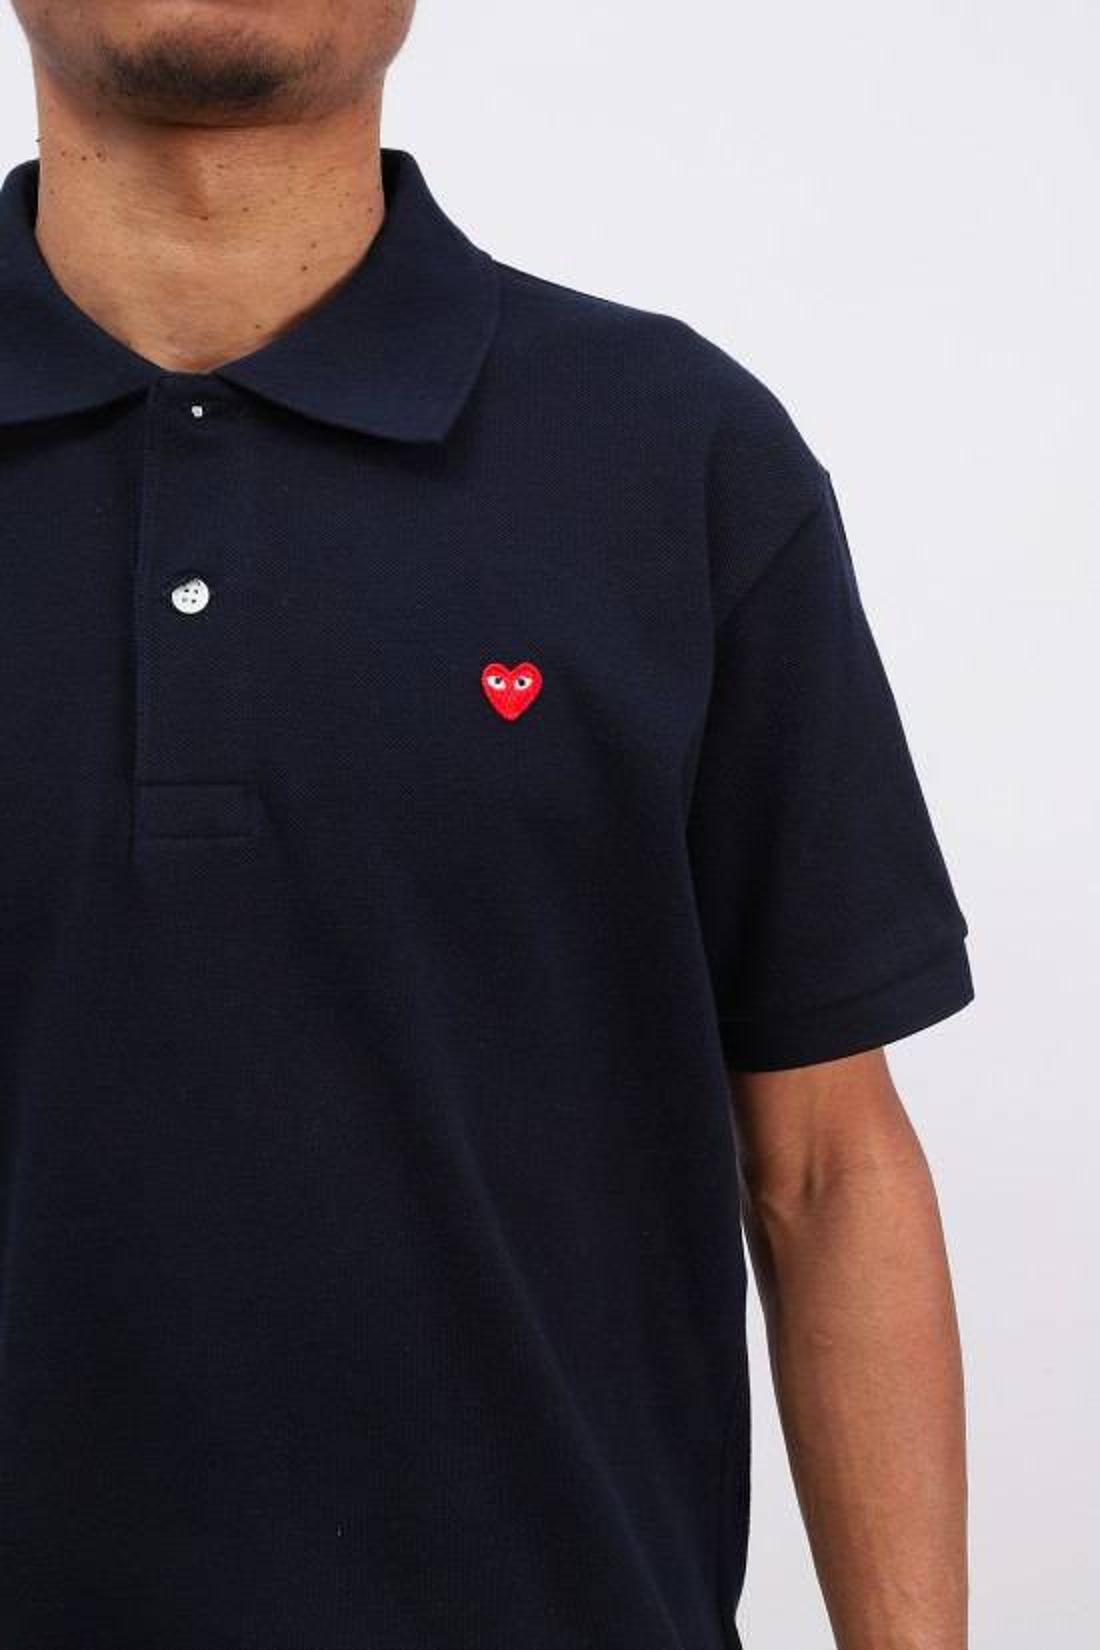 COMME DES GARÇONS PLAY / Play little red heart polo Navy